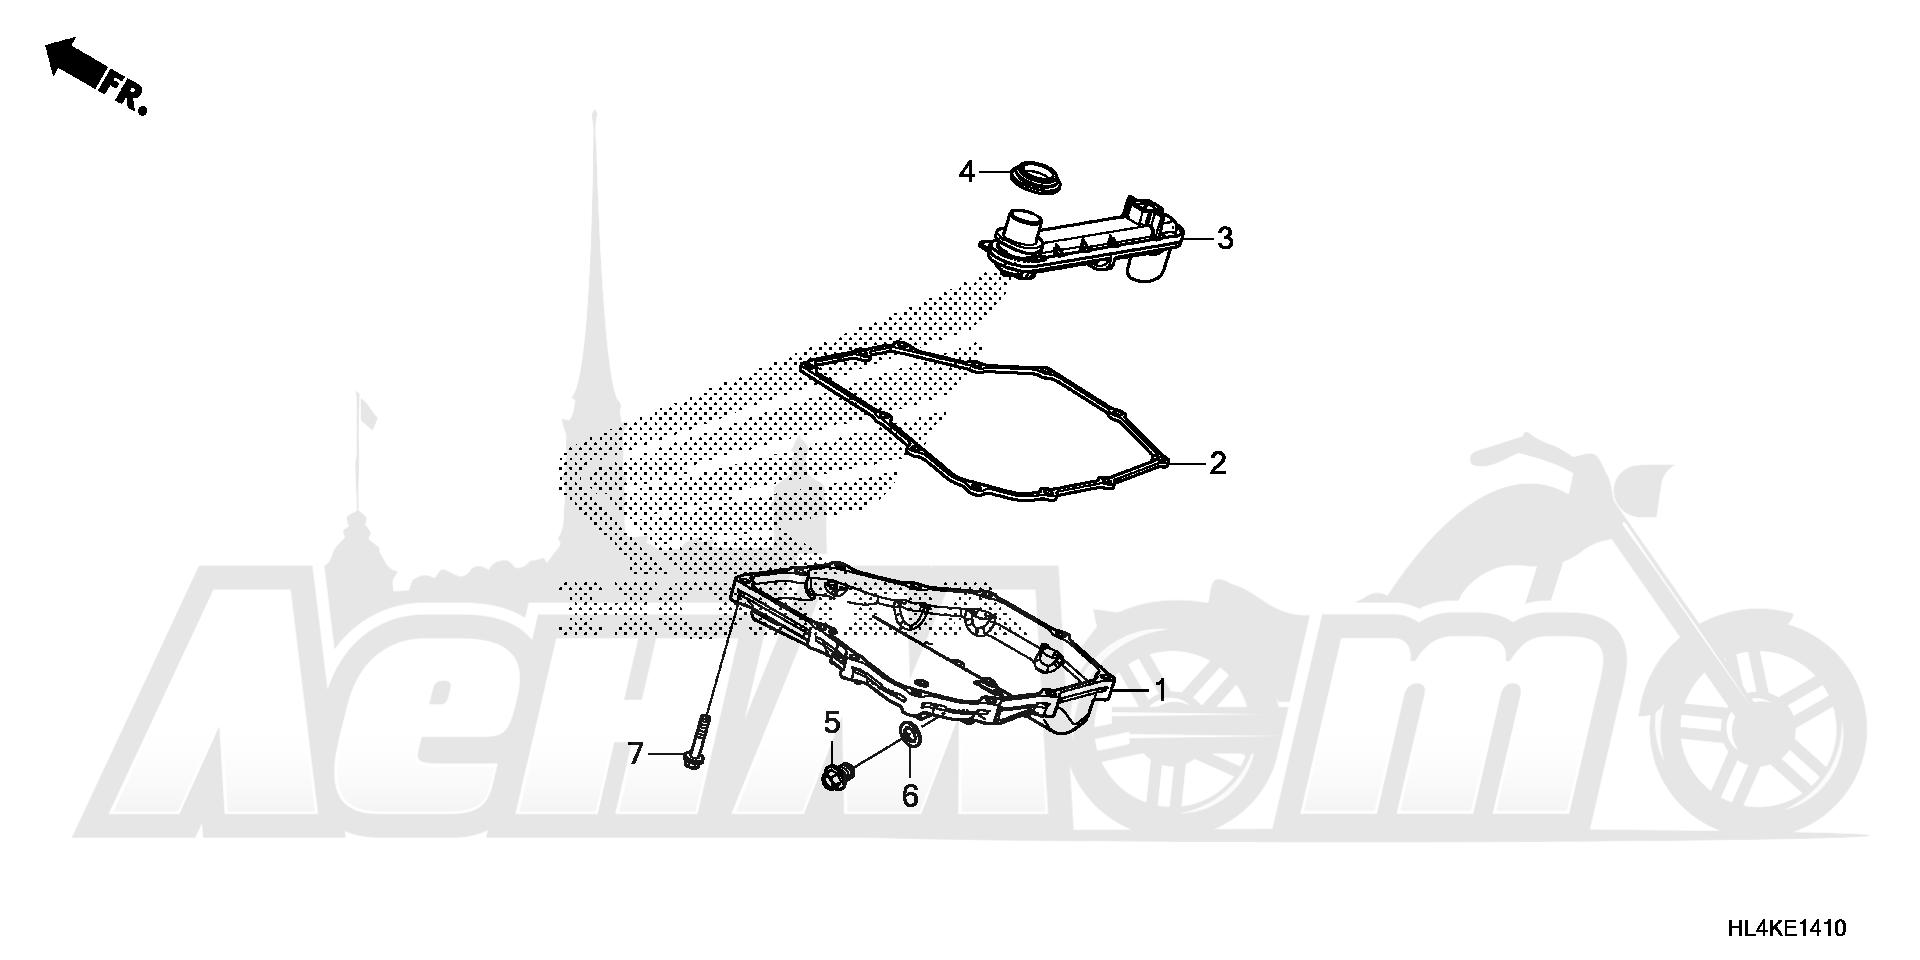 Запчасти для Квадроцикла Honda 2019 SXS1000M3L Раздел: OIL PAN   маслянный поддон